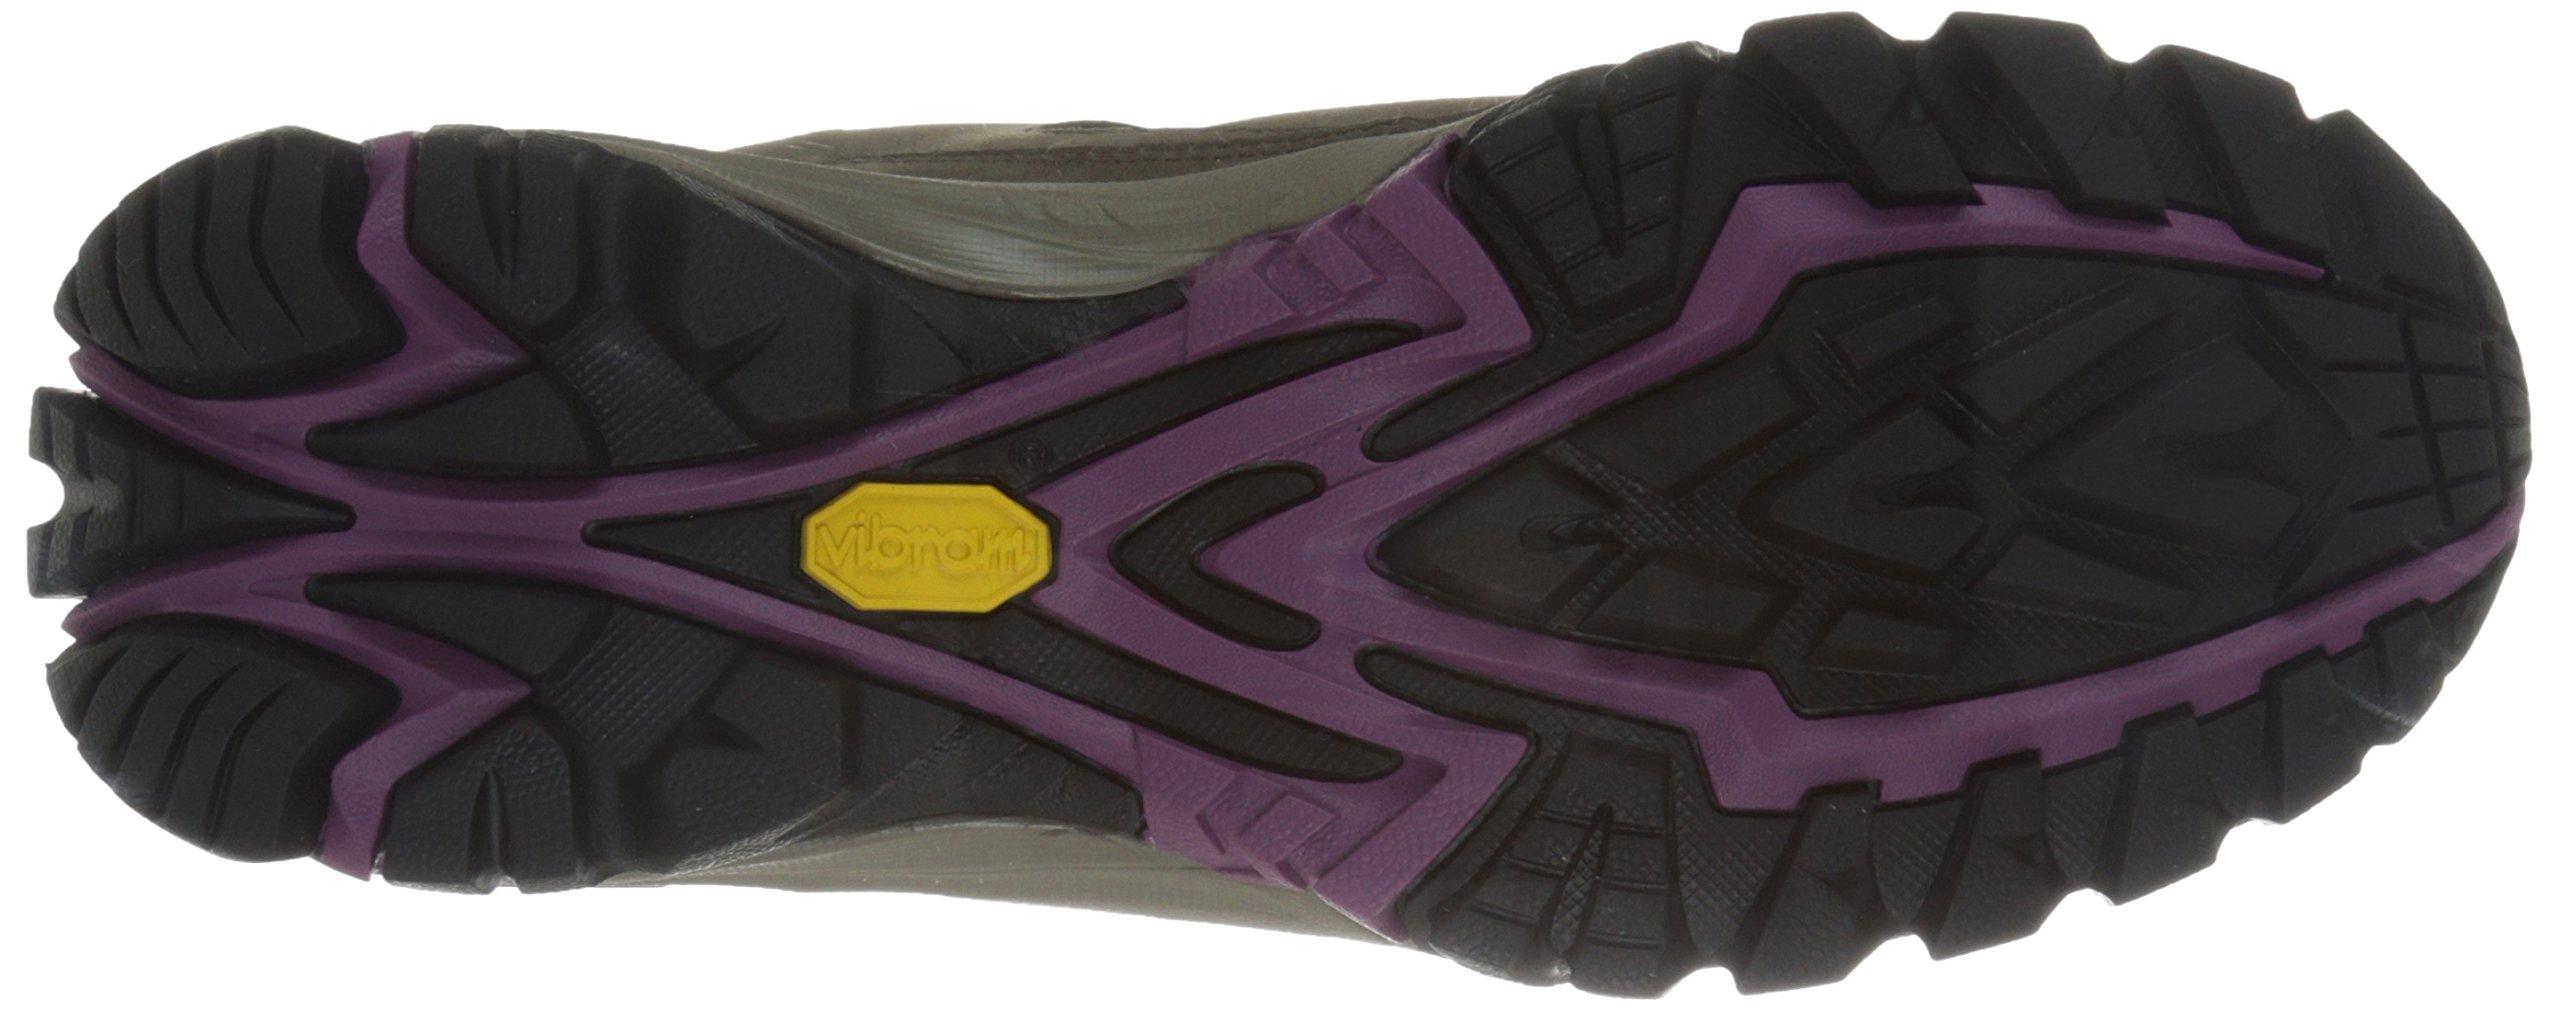 Vasque Women's Talus Trek Low UltraDry Hiking Shoe, Black Olive/Damson, 8.5 M US by Vasque (Image #3)